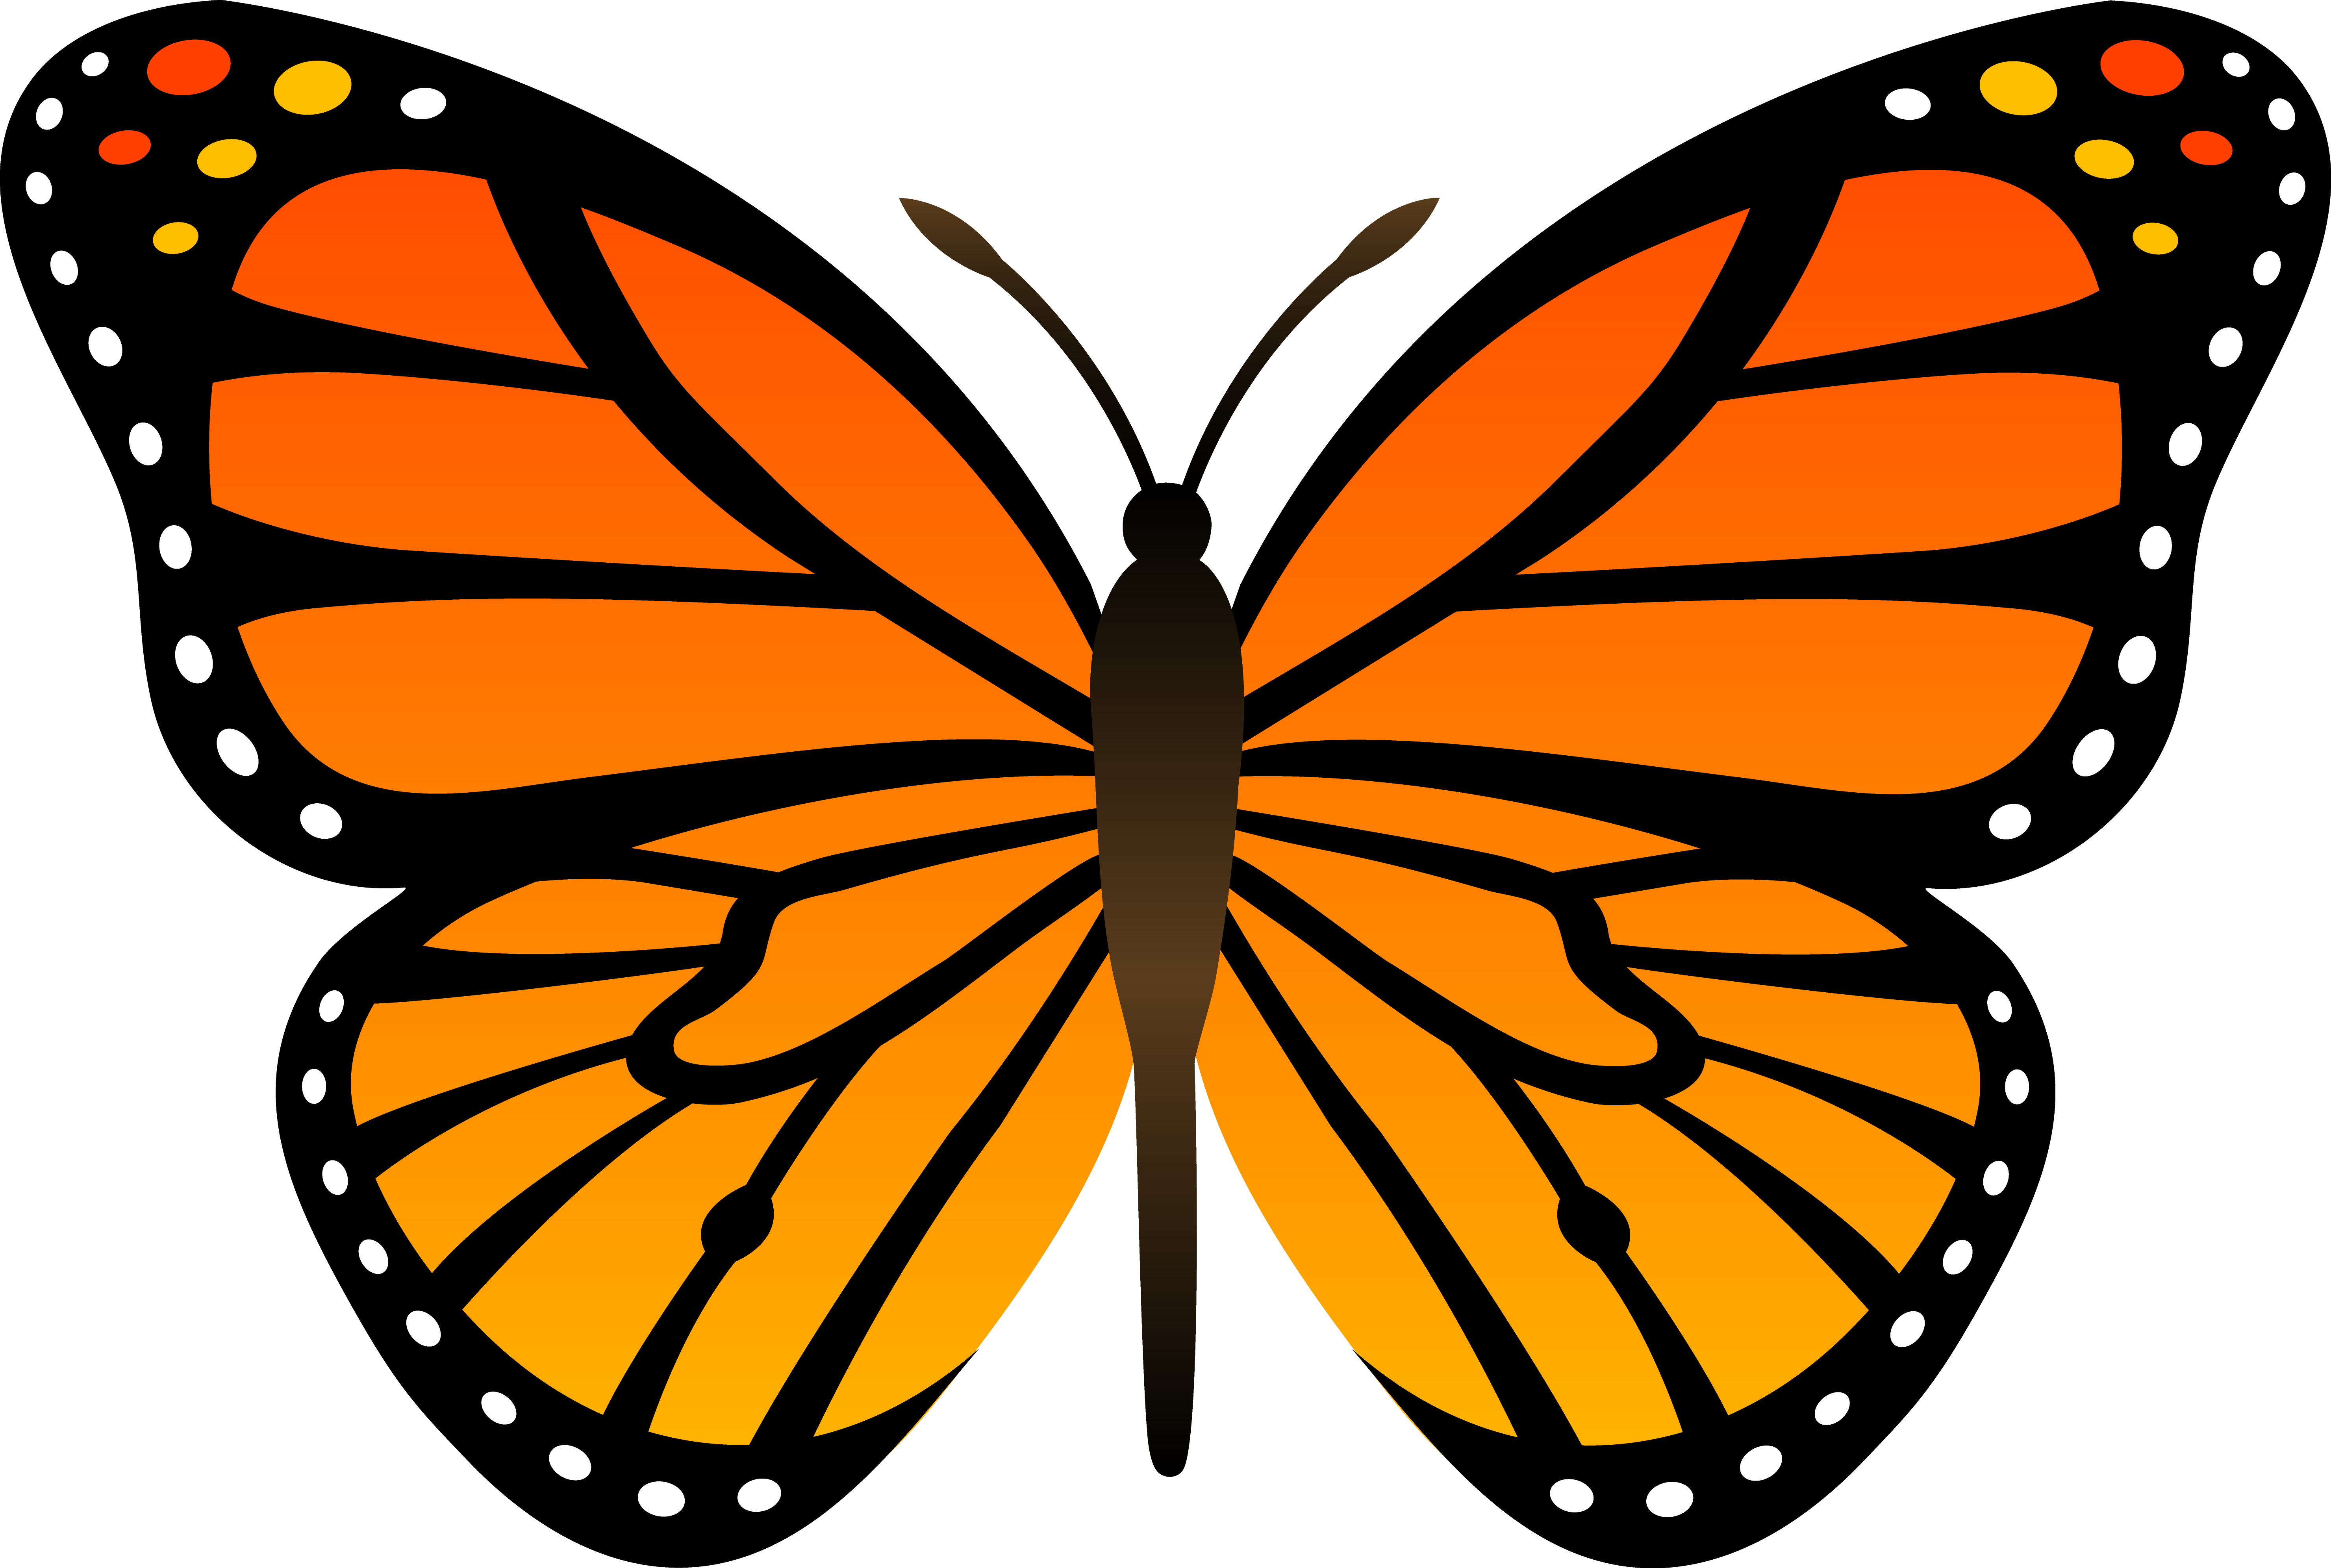 Butterfly clip art butterfly clipart graphicsde butterfly